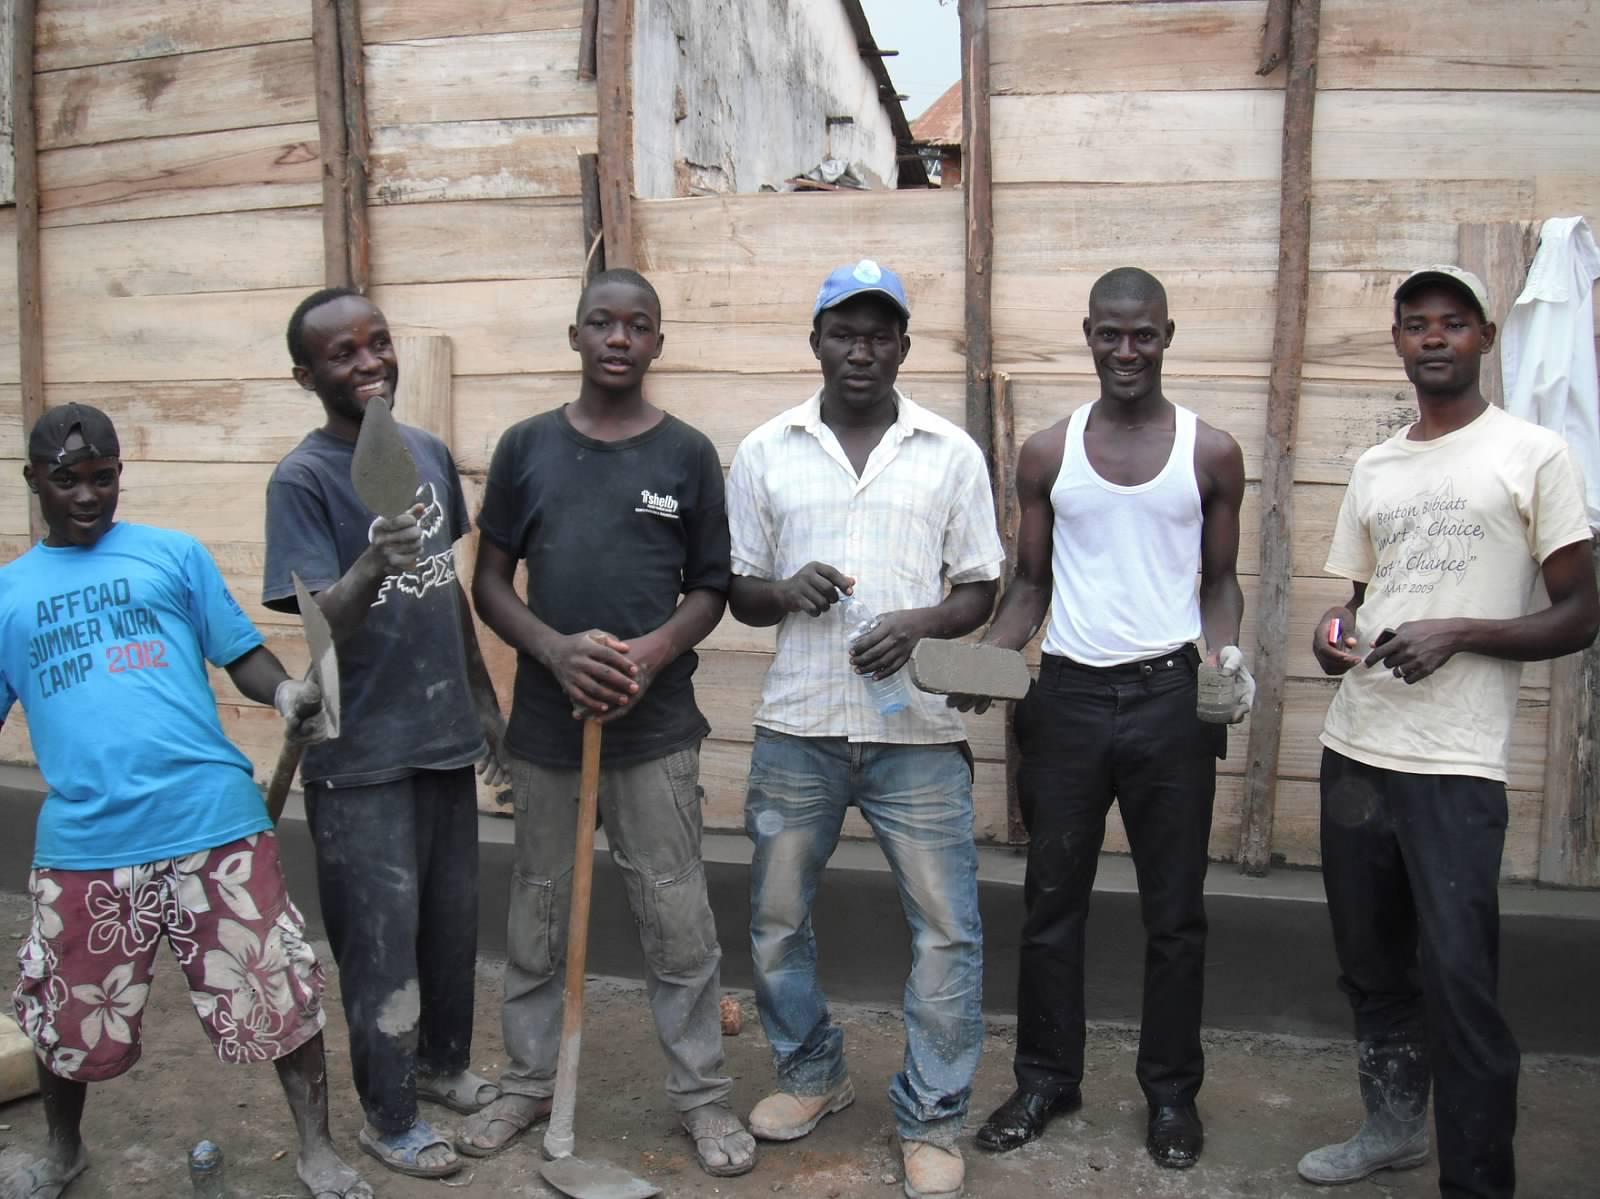 Community involvement at our rebuild